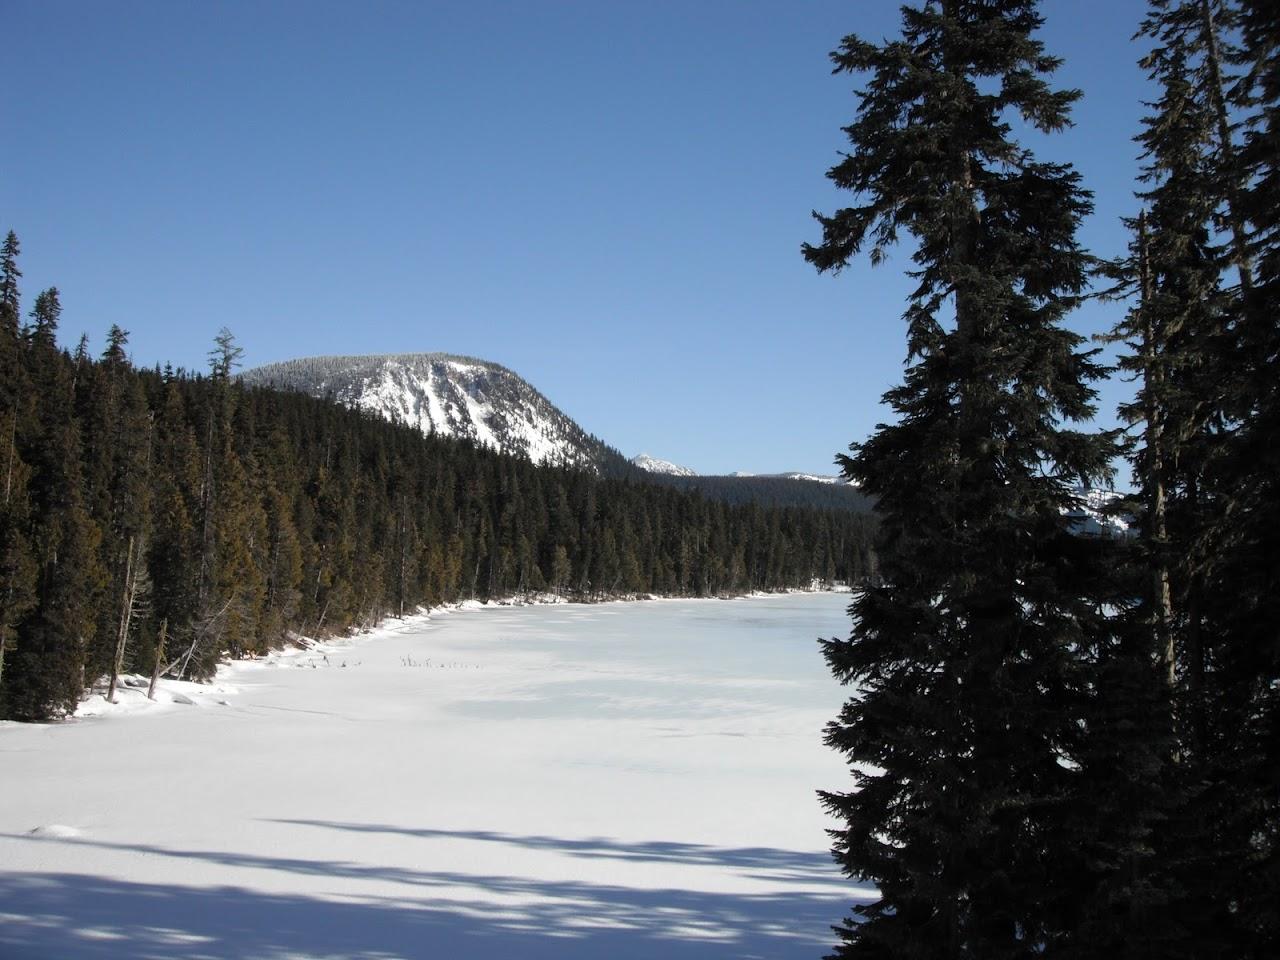 Cross Country Skiing - DSCF1535.JPG